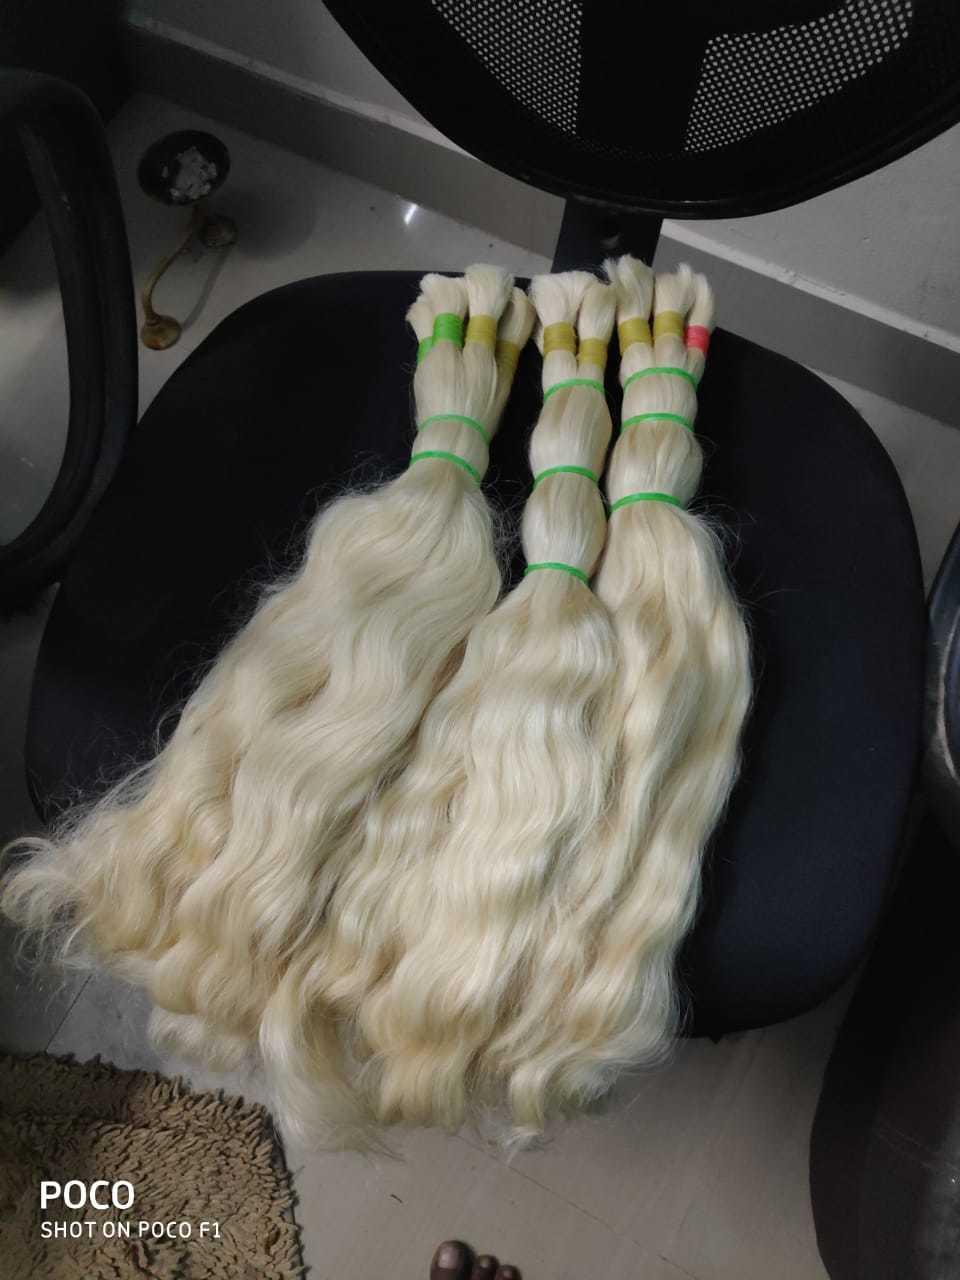 REMY INDIAN SINGLE DRAWN HAIR